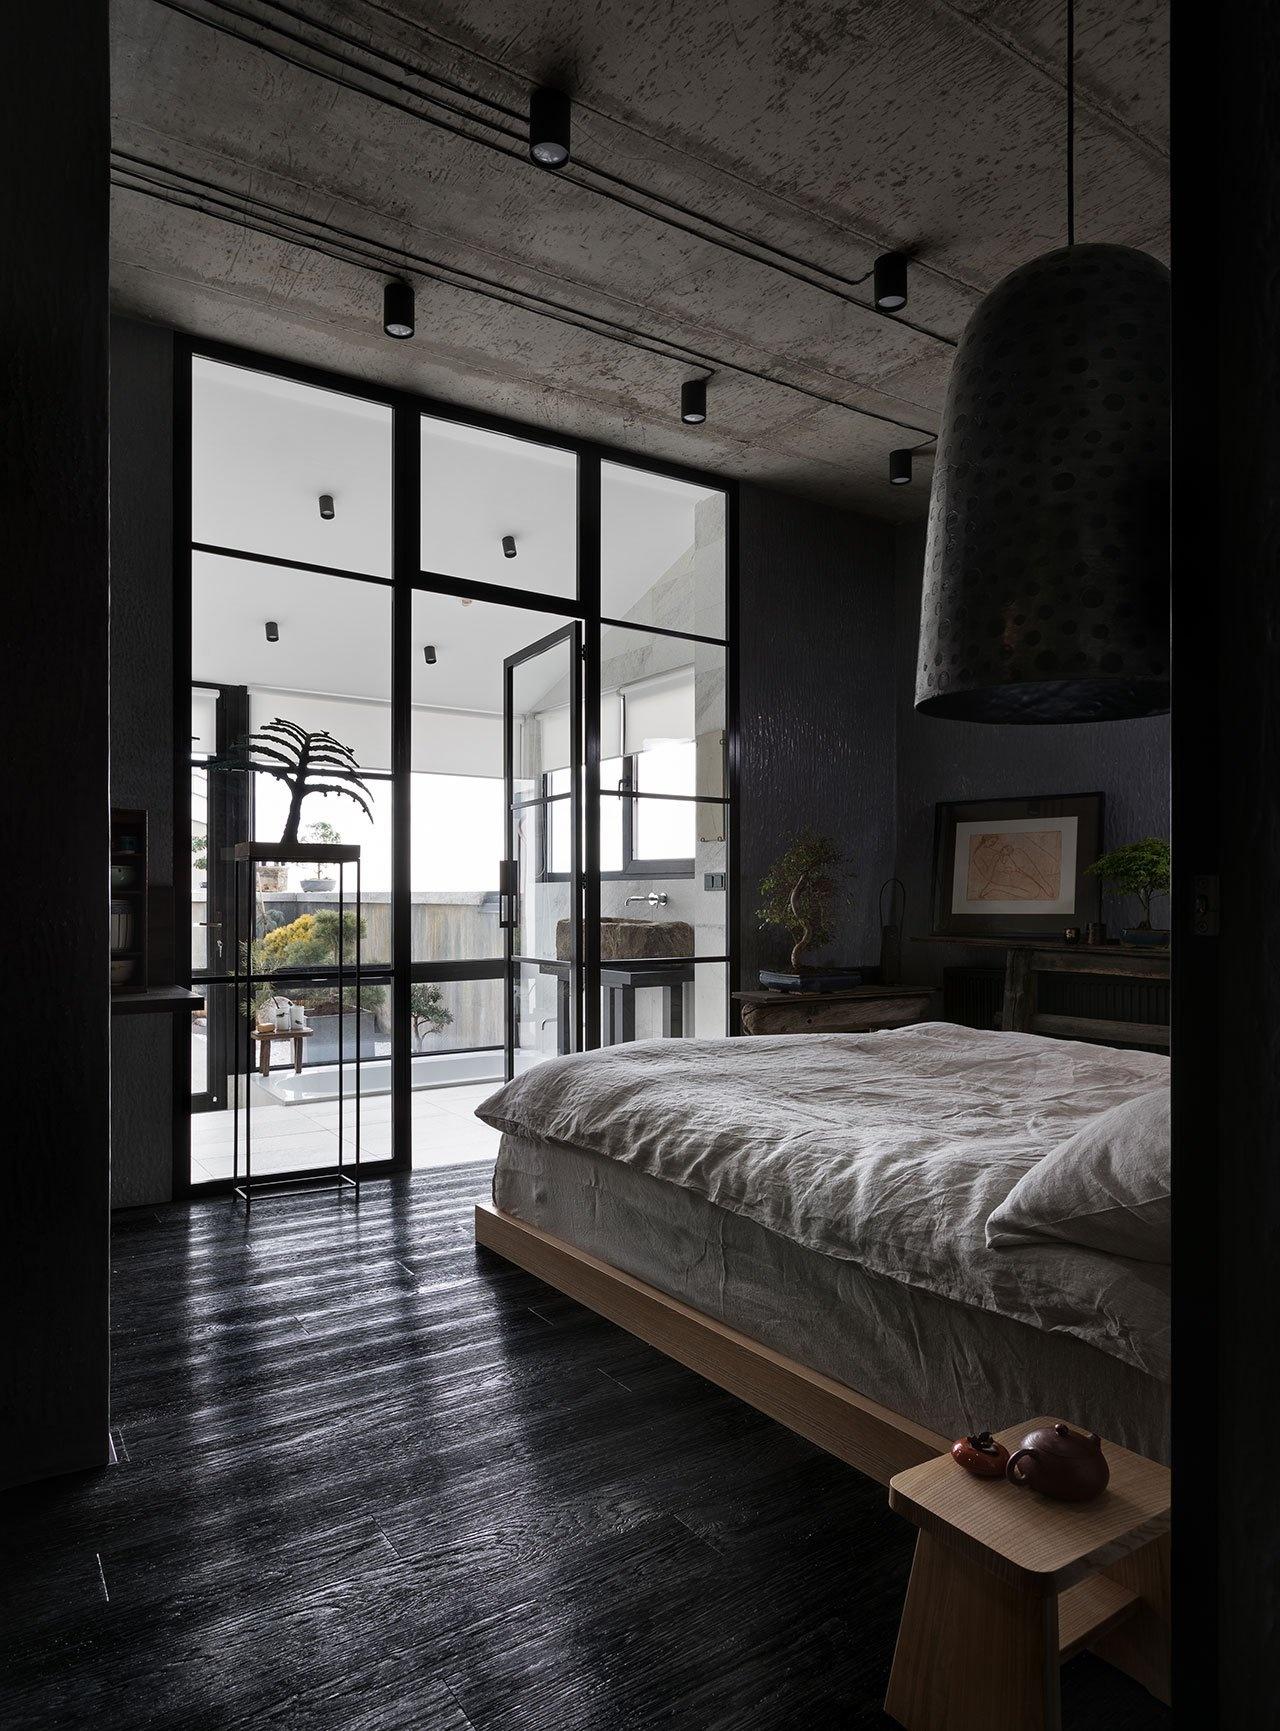 s1_wabi_sabi_apartment_by_sergey_makhno_architects_yatzer